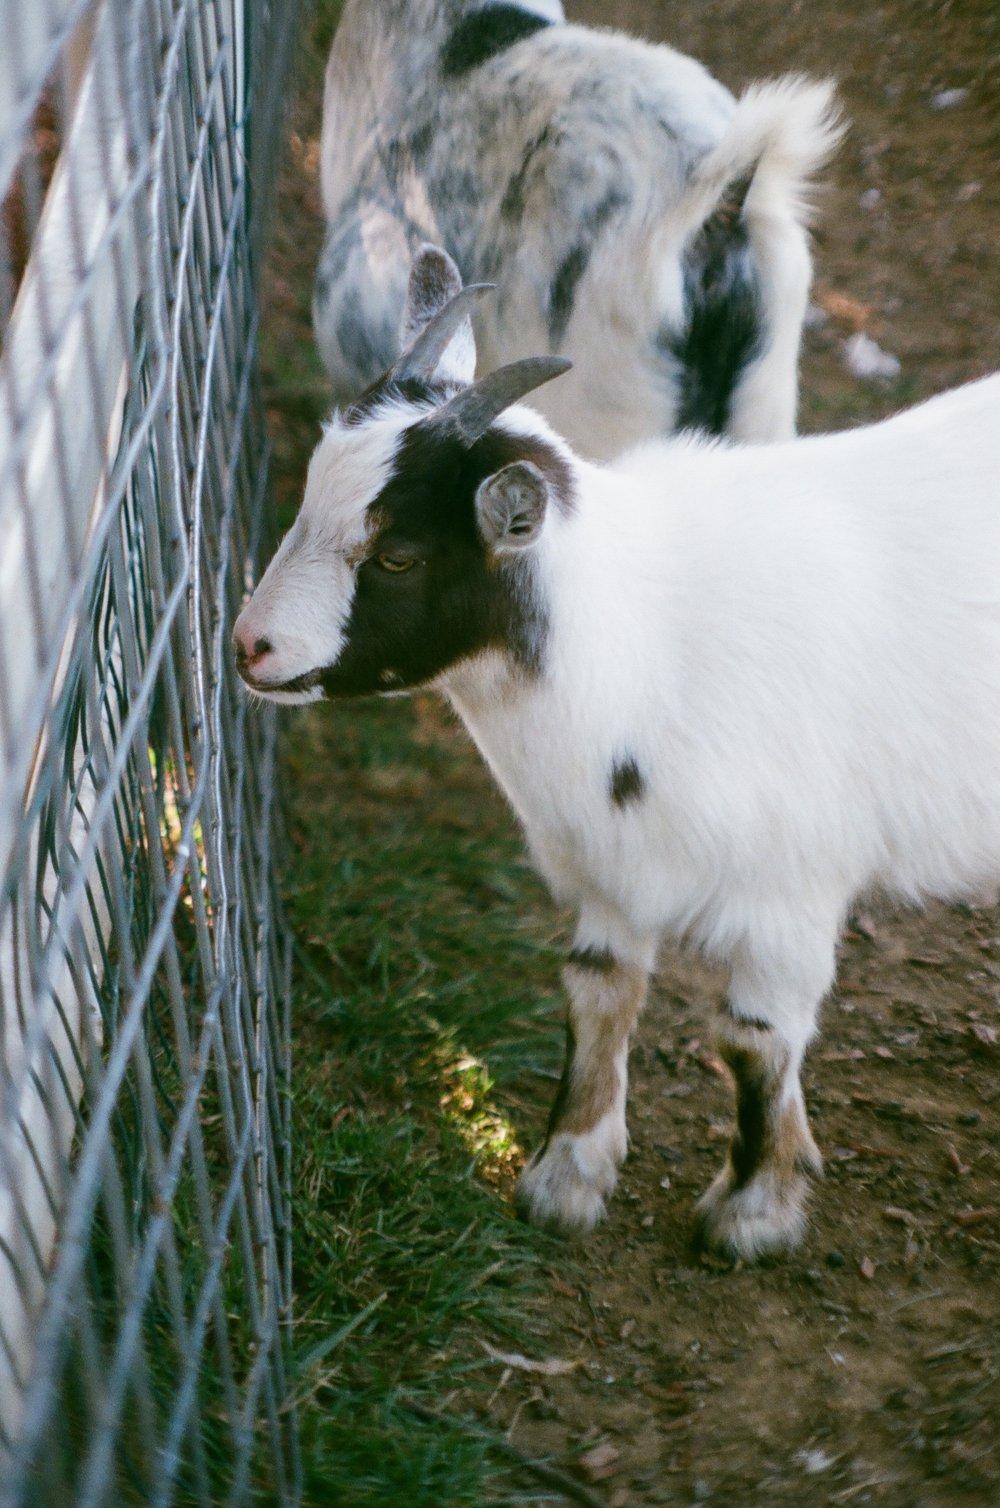 Goat_Petting_Zoo_PA-2.jpg